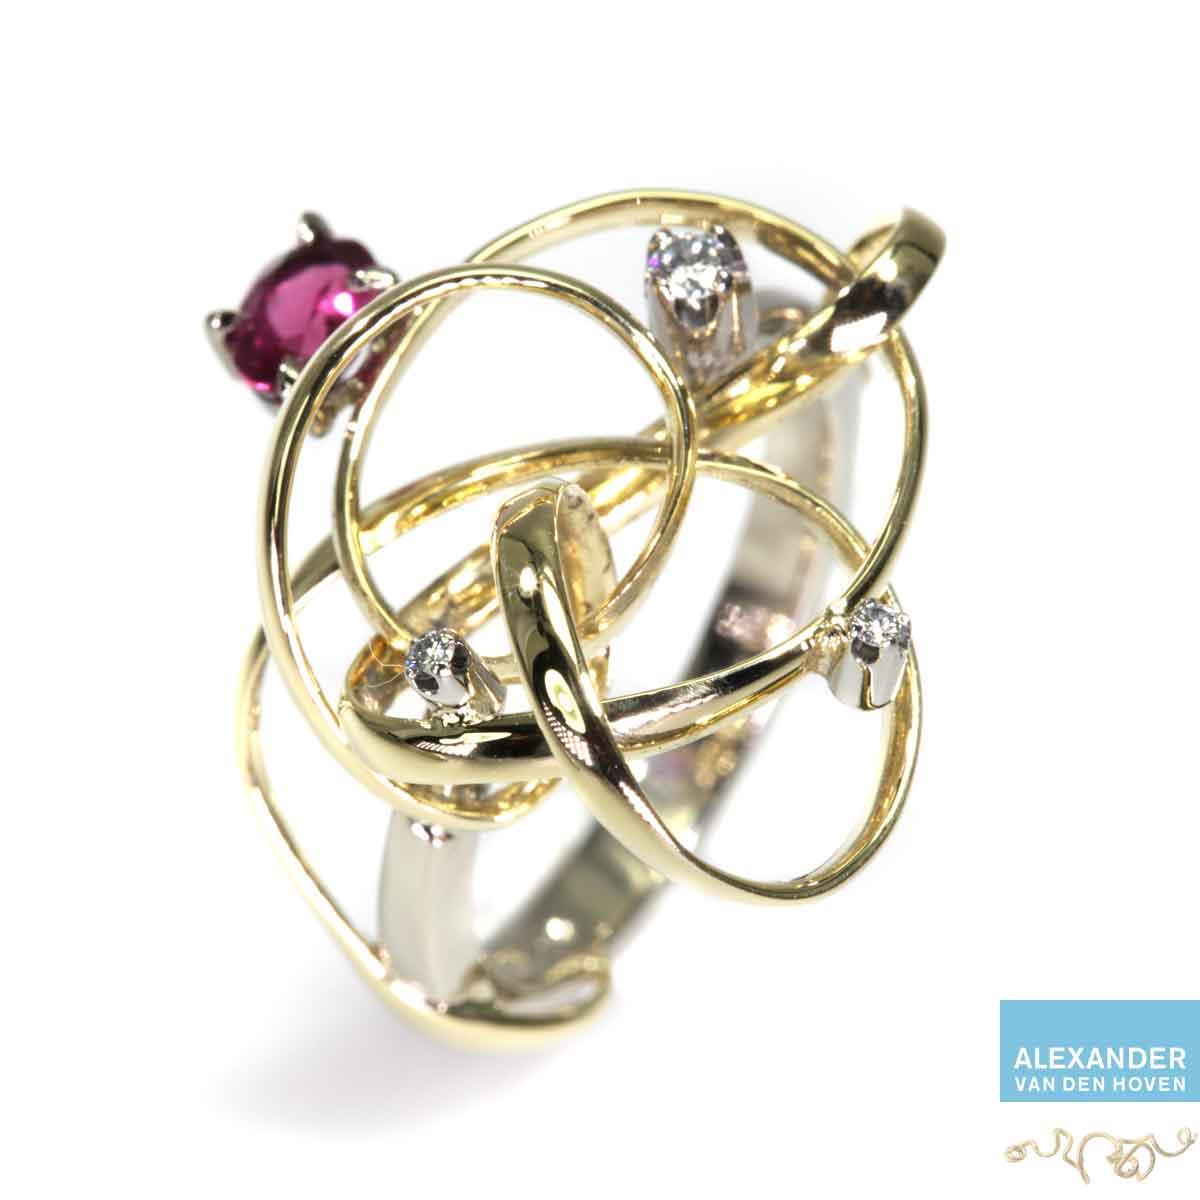 Gouden-krul-ring-Robijn-Diamanten-golvende-briljanten-krullen